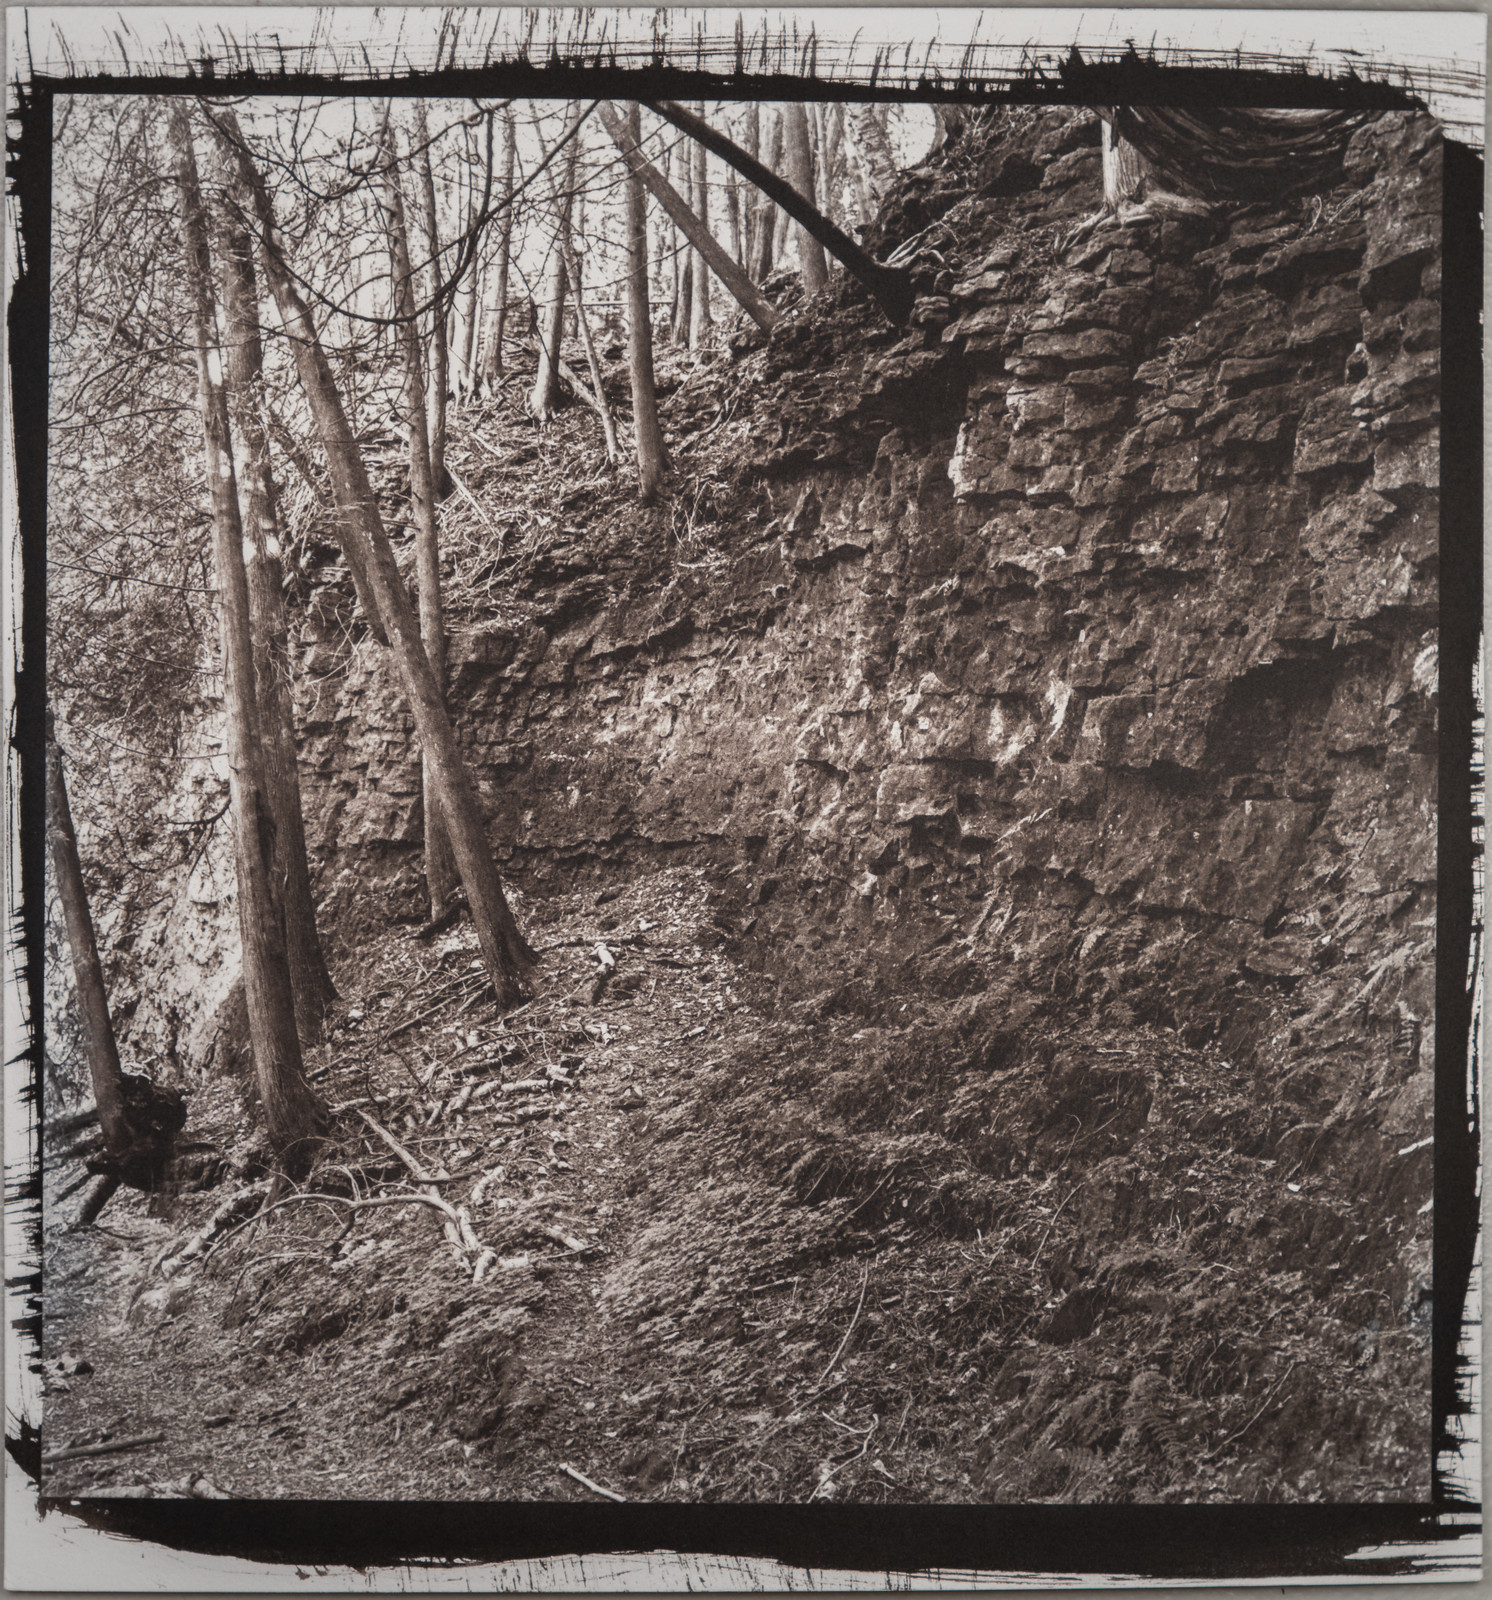 Gorge Wall